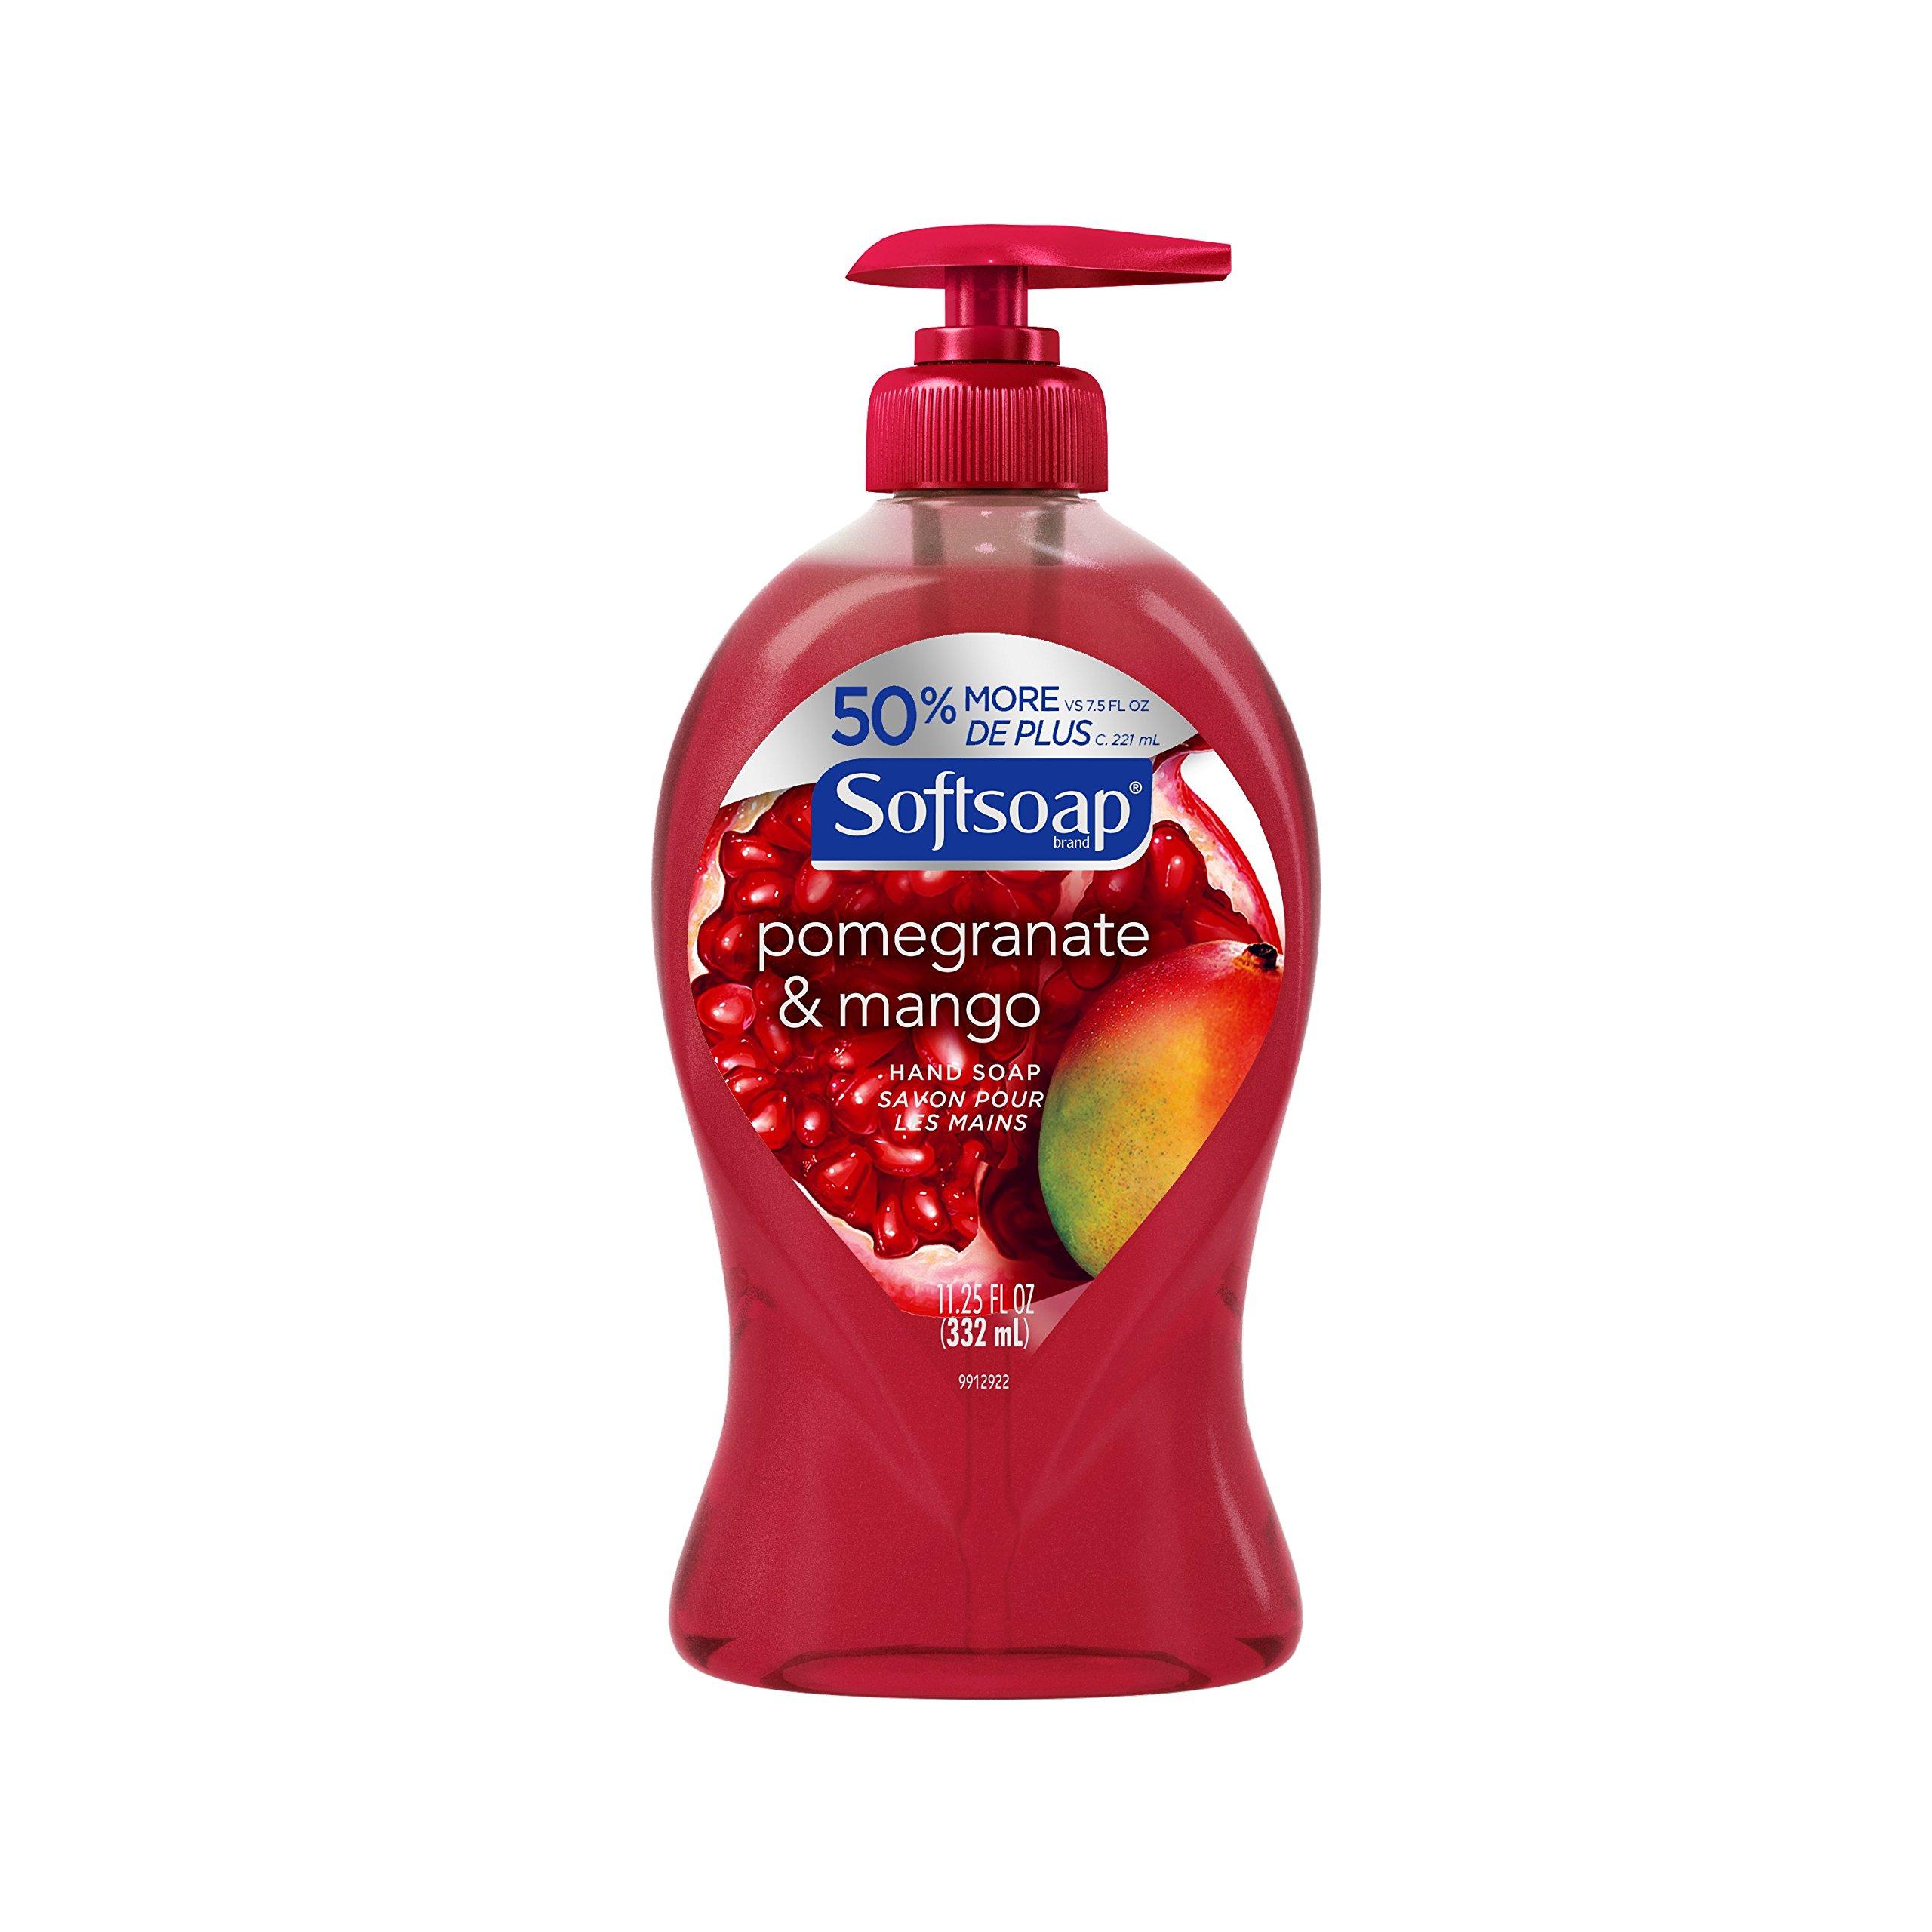 Amazon.com : Softsoap Moisturizing Body Wash, Pomegranate